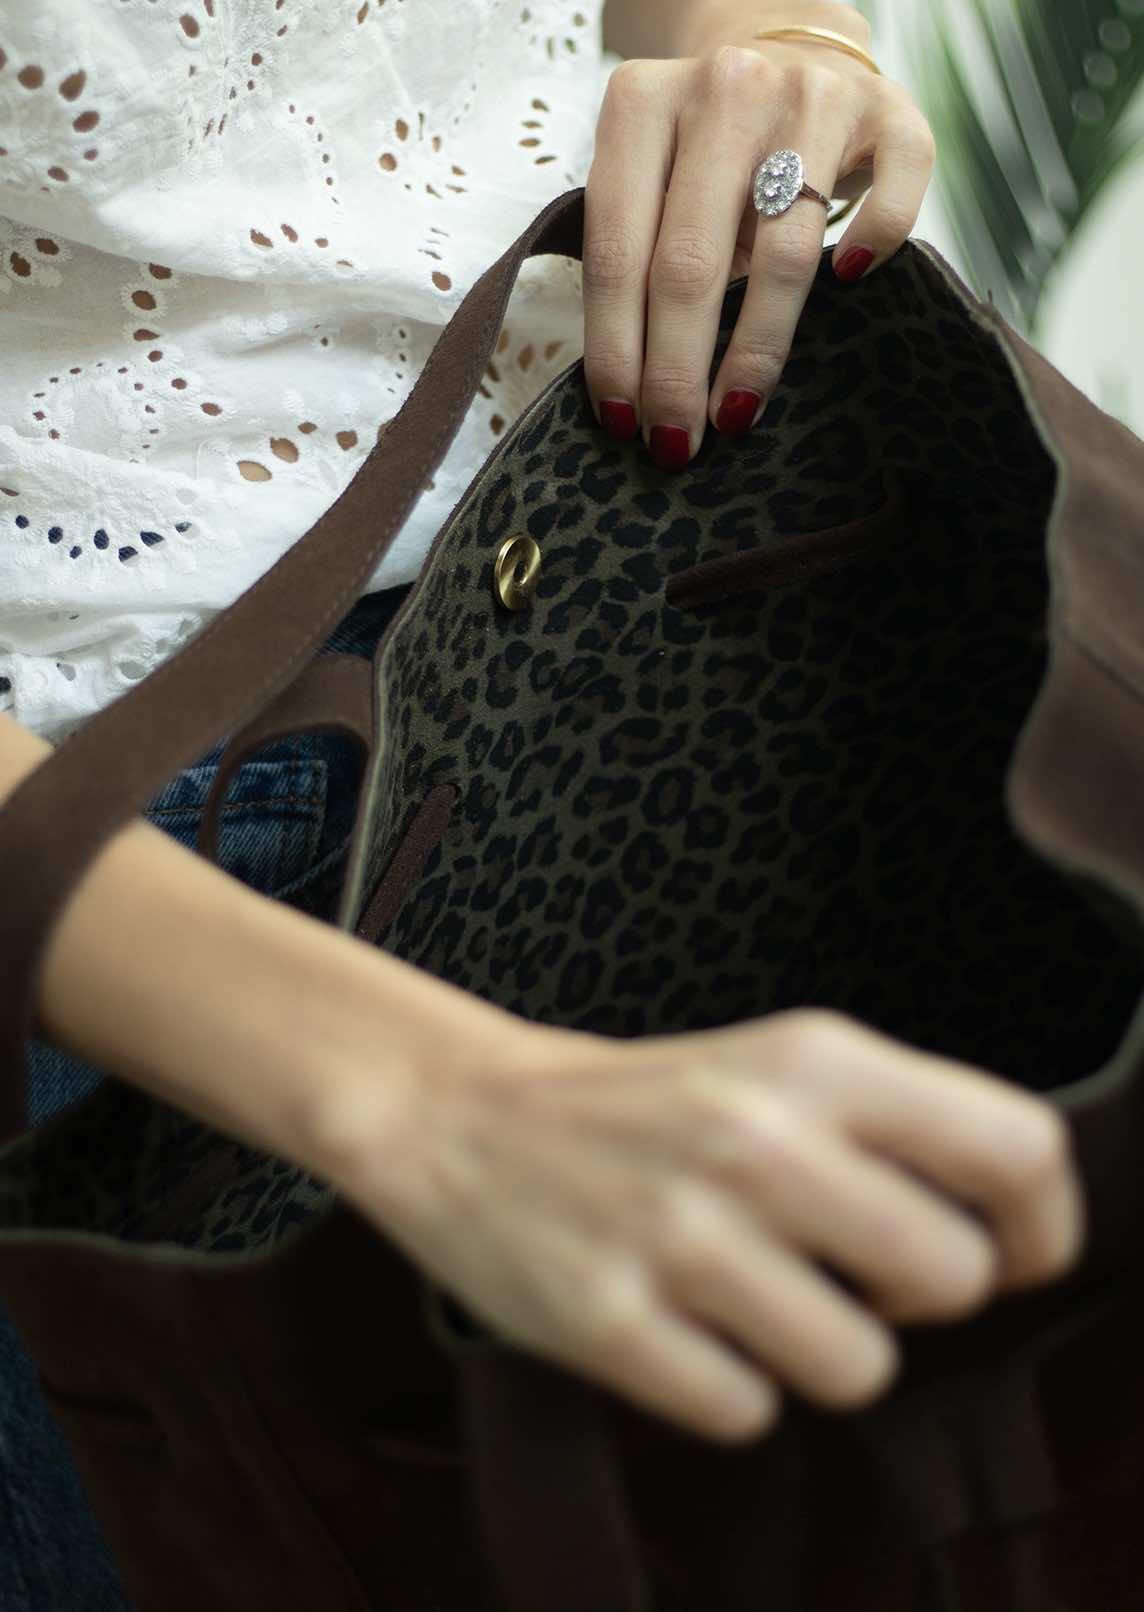 Grand sac Apolline daim marron intérieur léopard